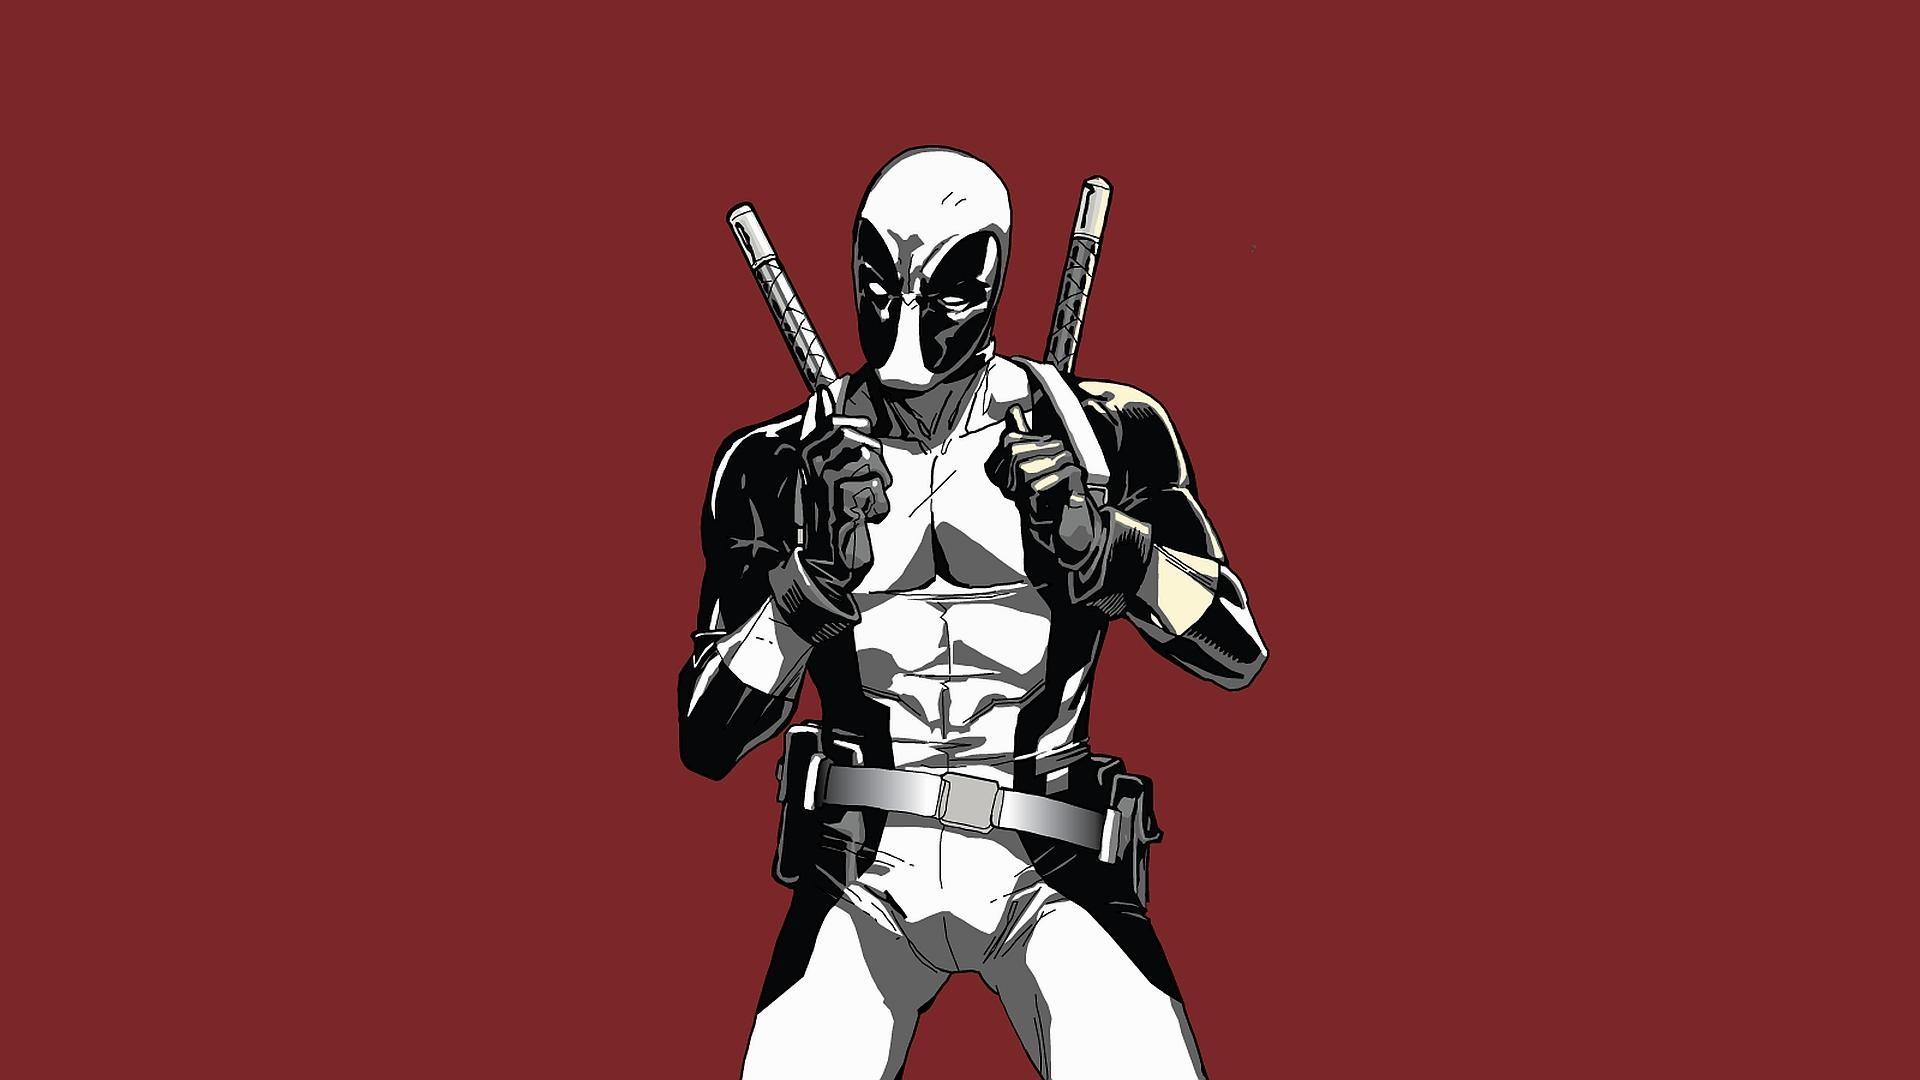 Deadpool-HD-Wallpaper-Desktop-Backgrounds